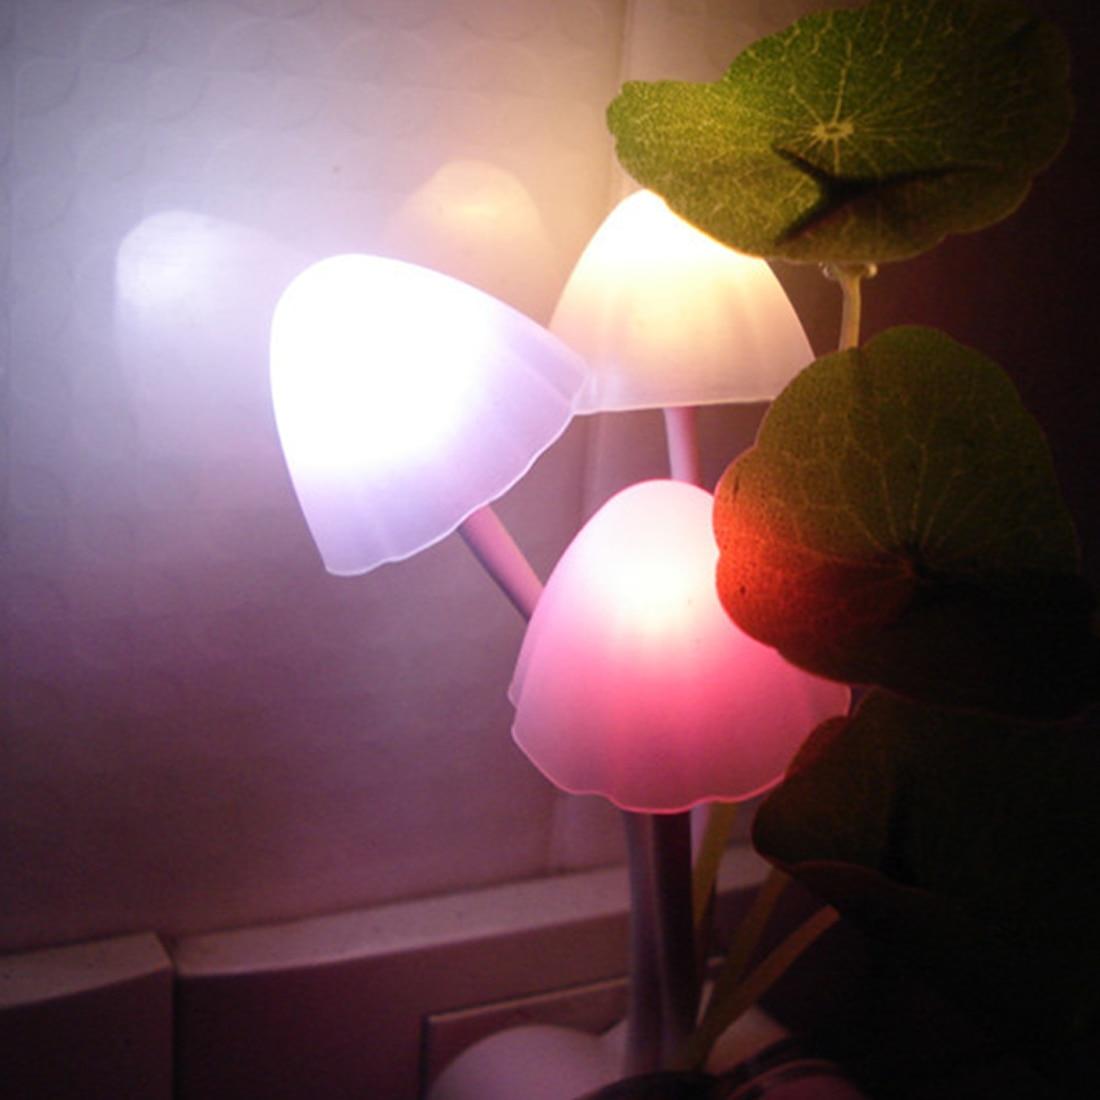 EU US Plug LED Night Light Mushroom Wall Socket Lights Lamp For Bedroom Home Decoration Hot Light-controlled Sensor